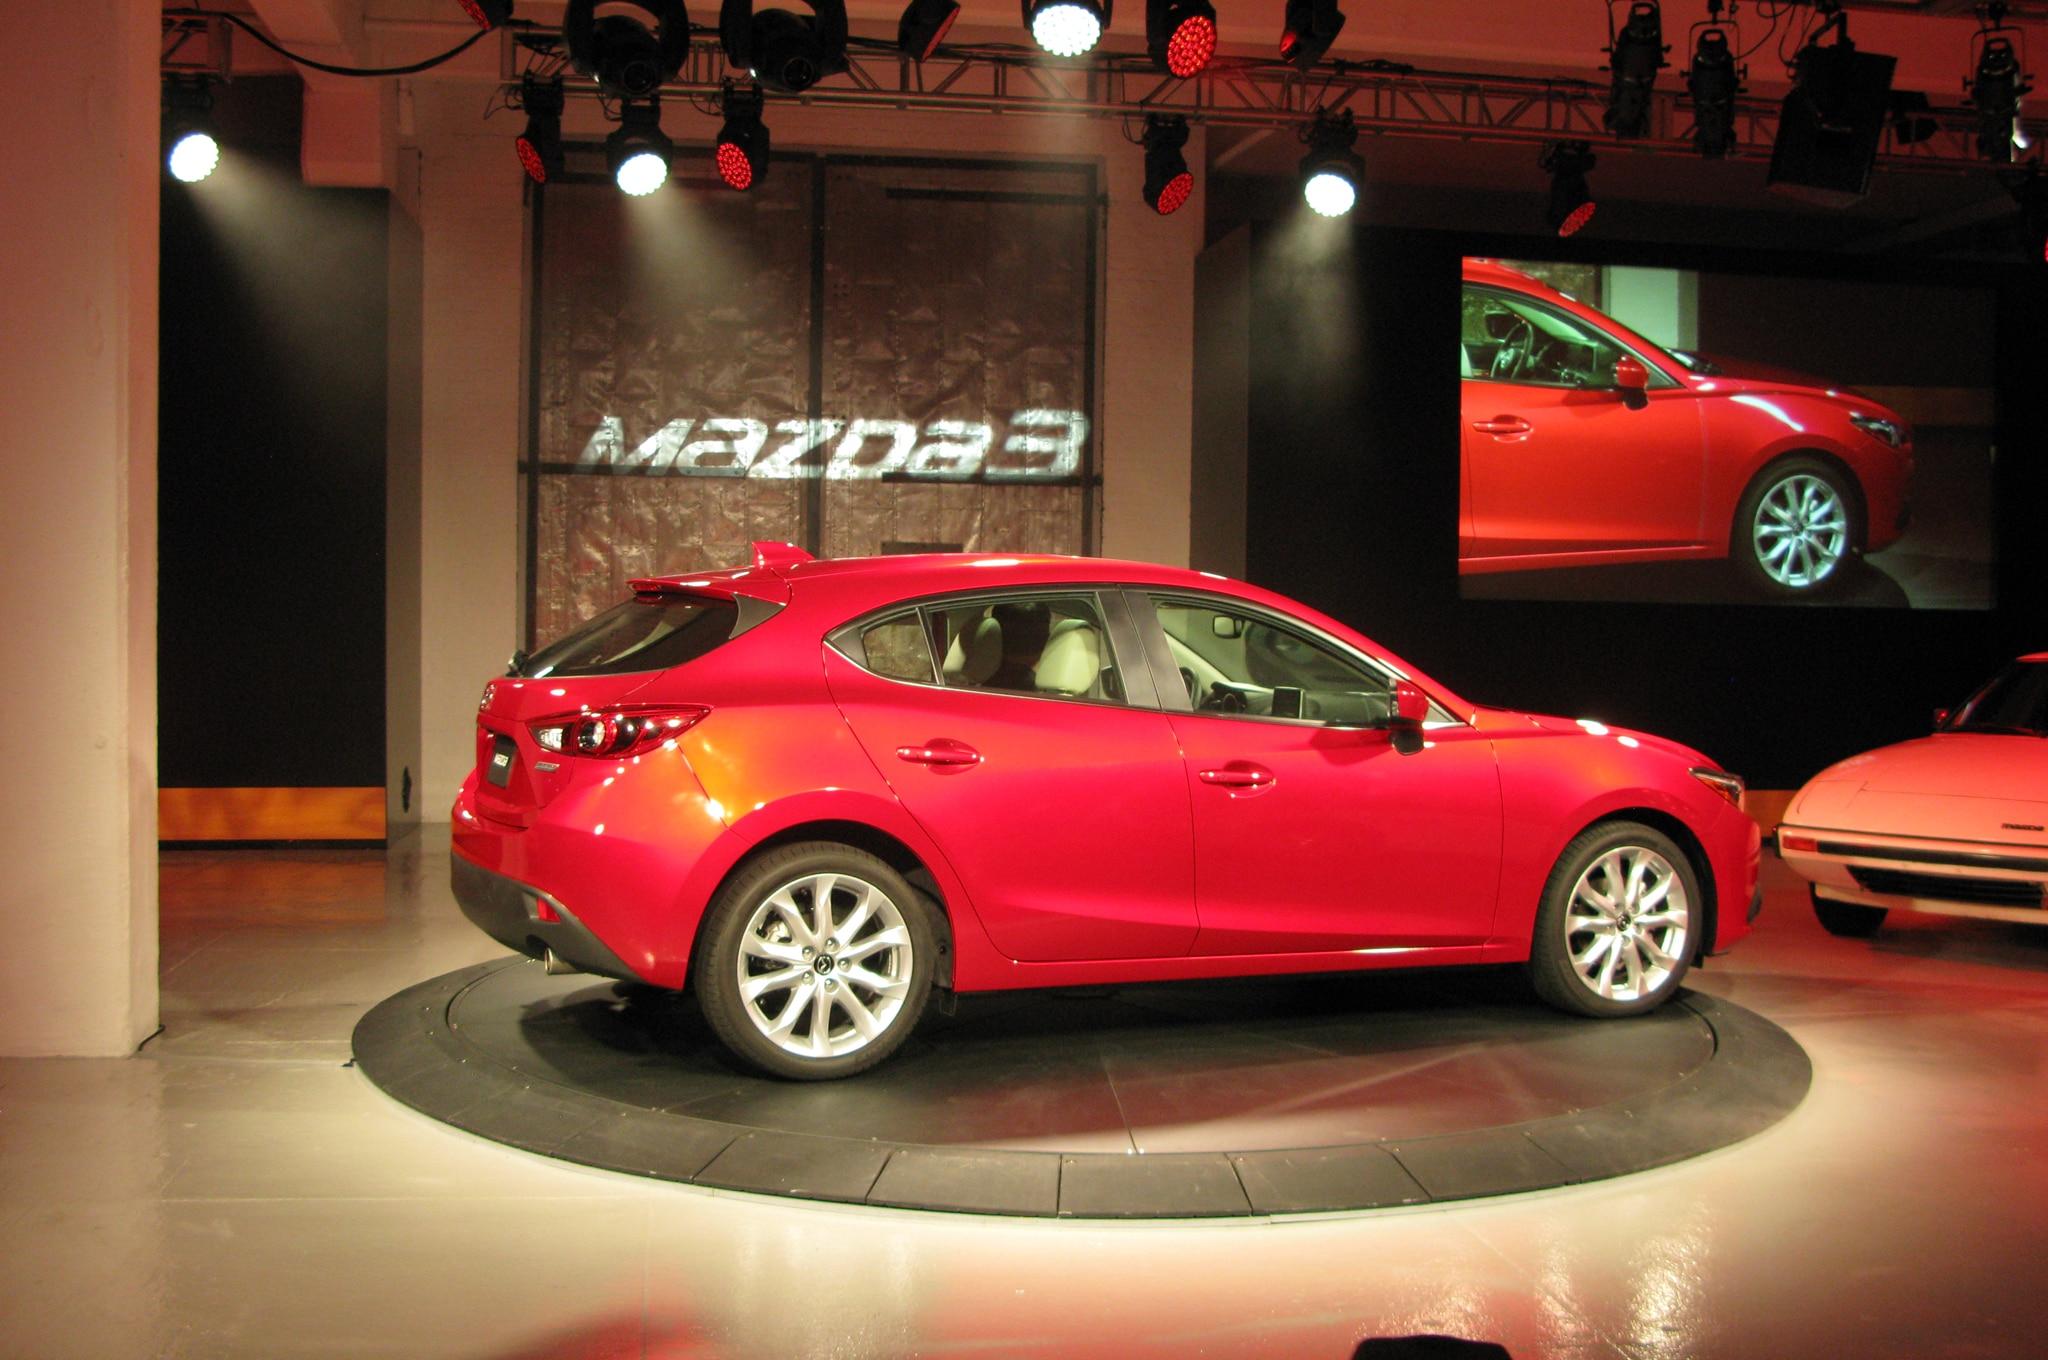 Mazda California Design Studio